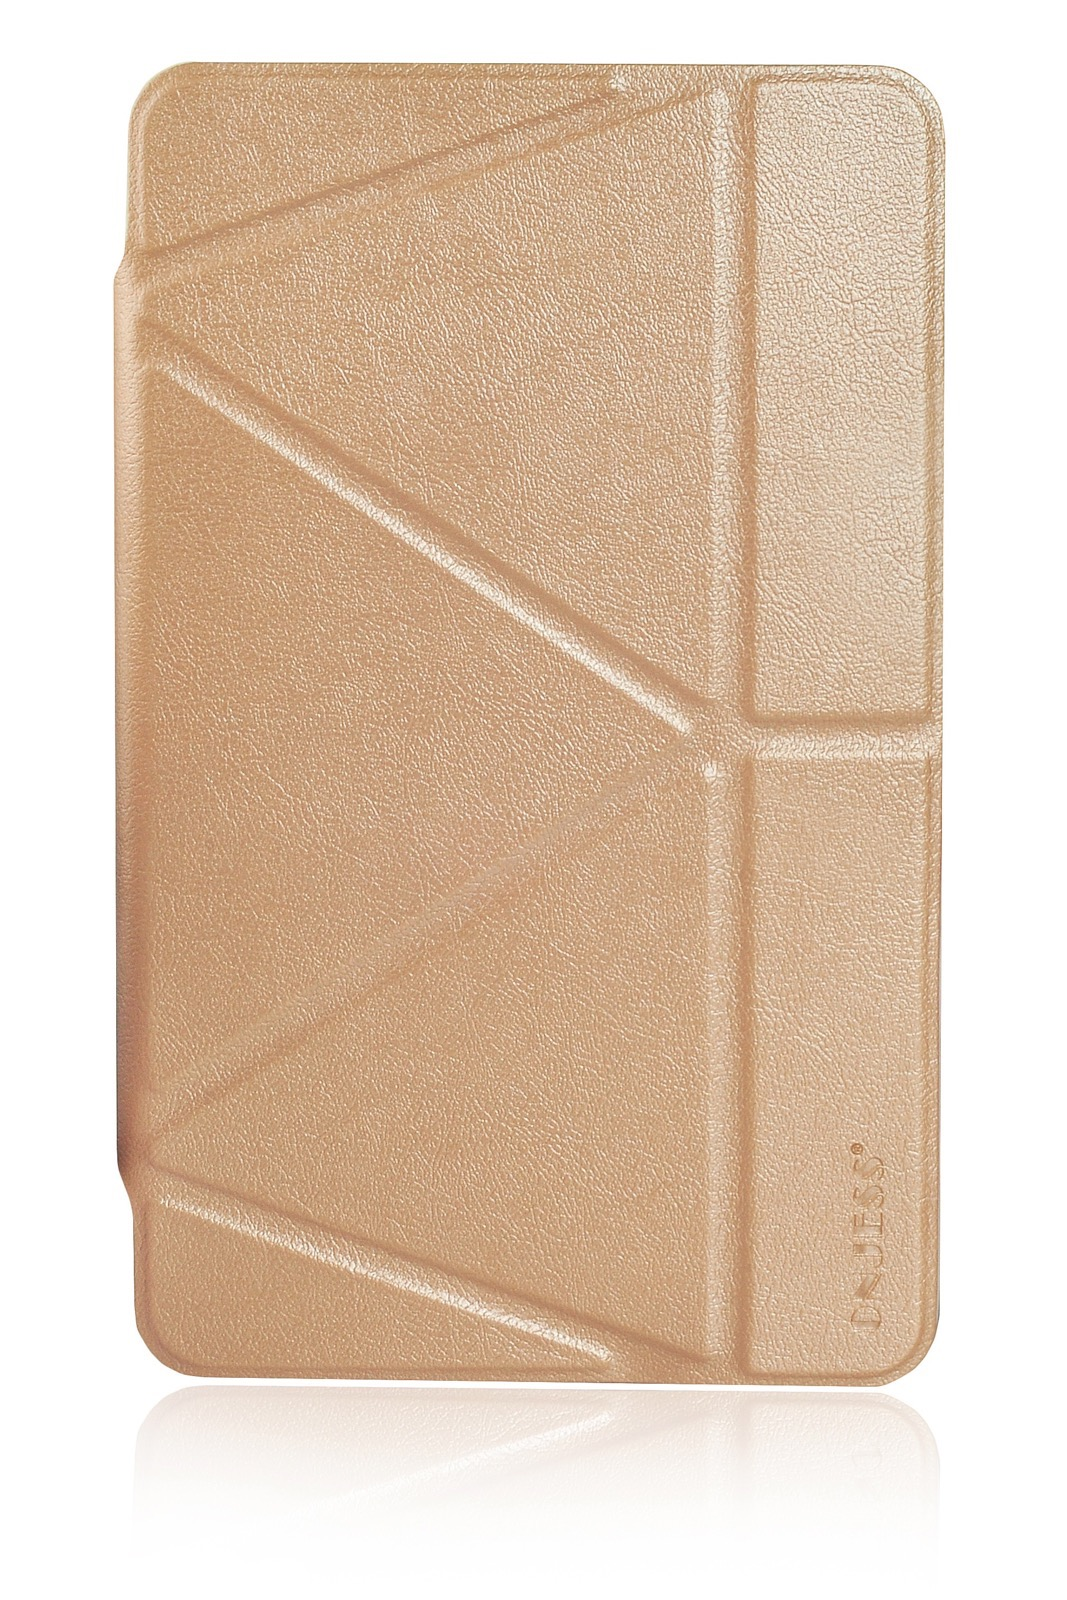 Чехол для планшета Onjess Smart для Samsung Tab S4 10.5 T835, золотой аксессуар чехол onjess для samsung tab s4 10 5 t835 smart grey 908031